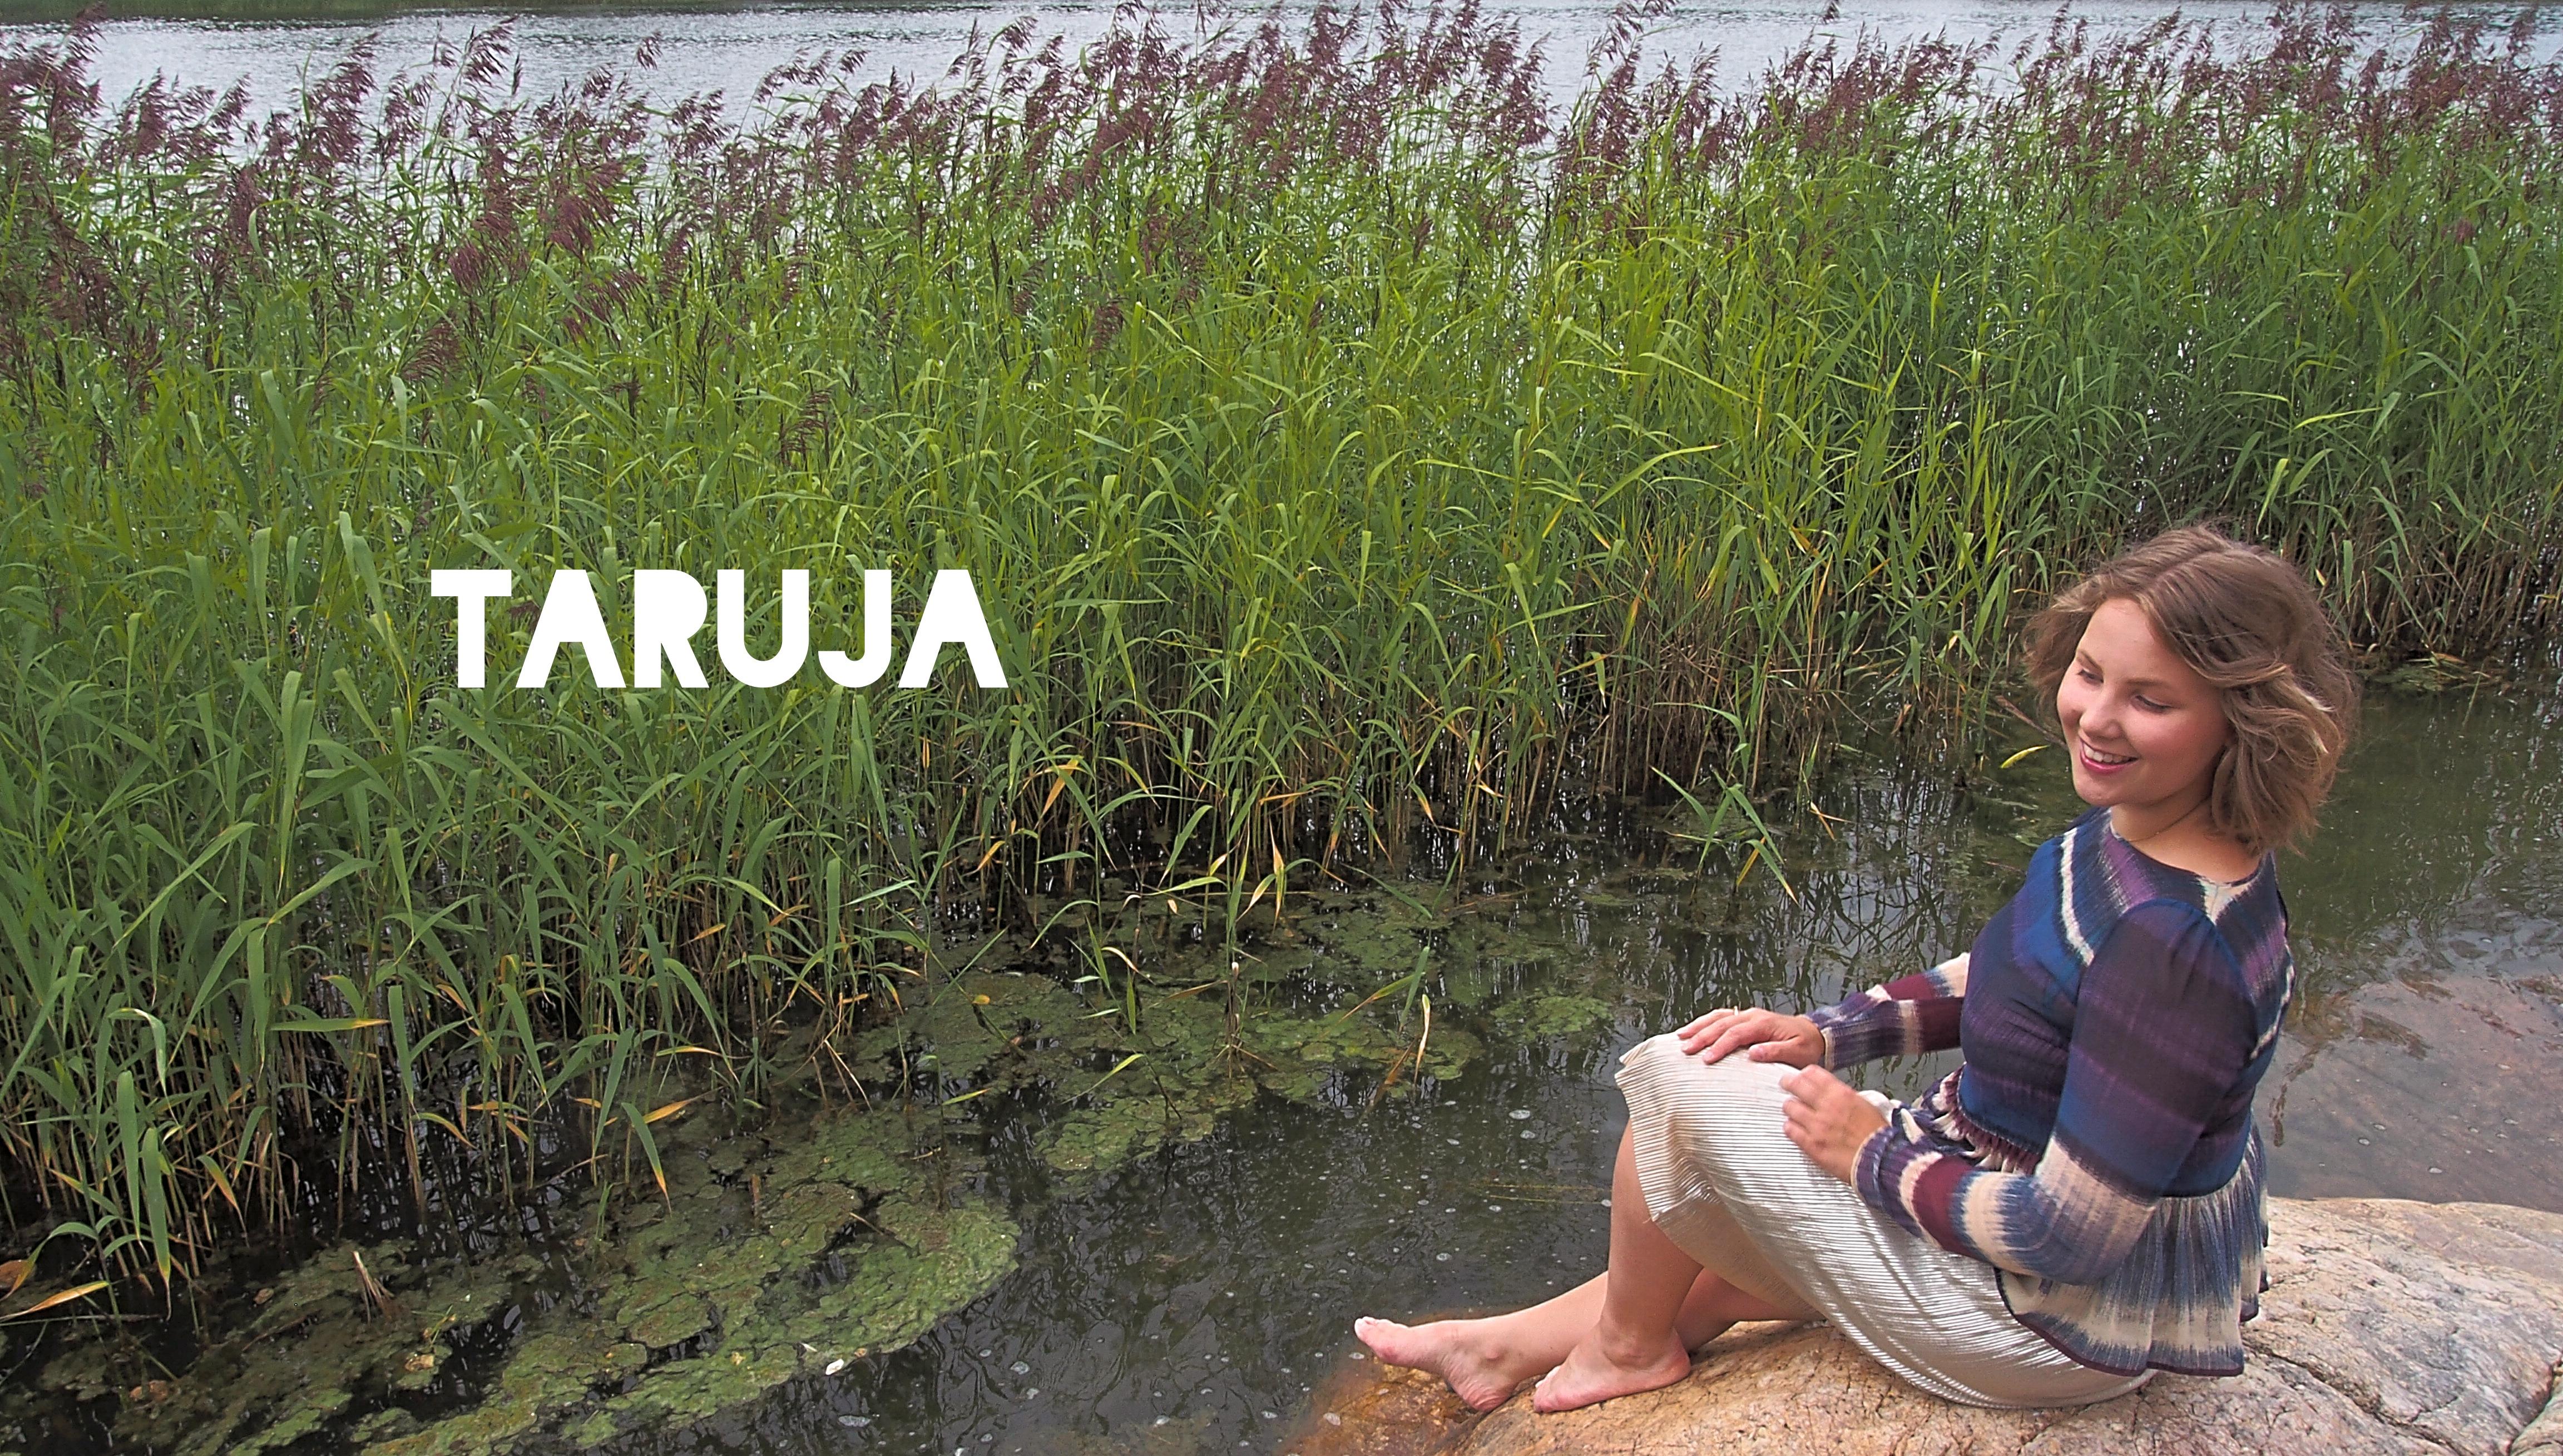 Taruja